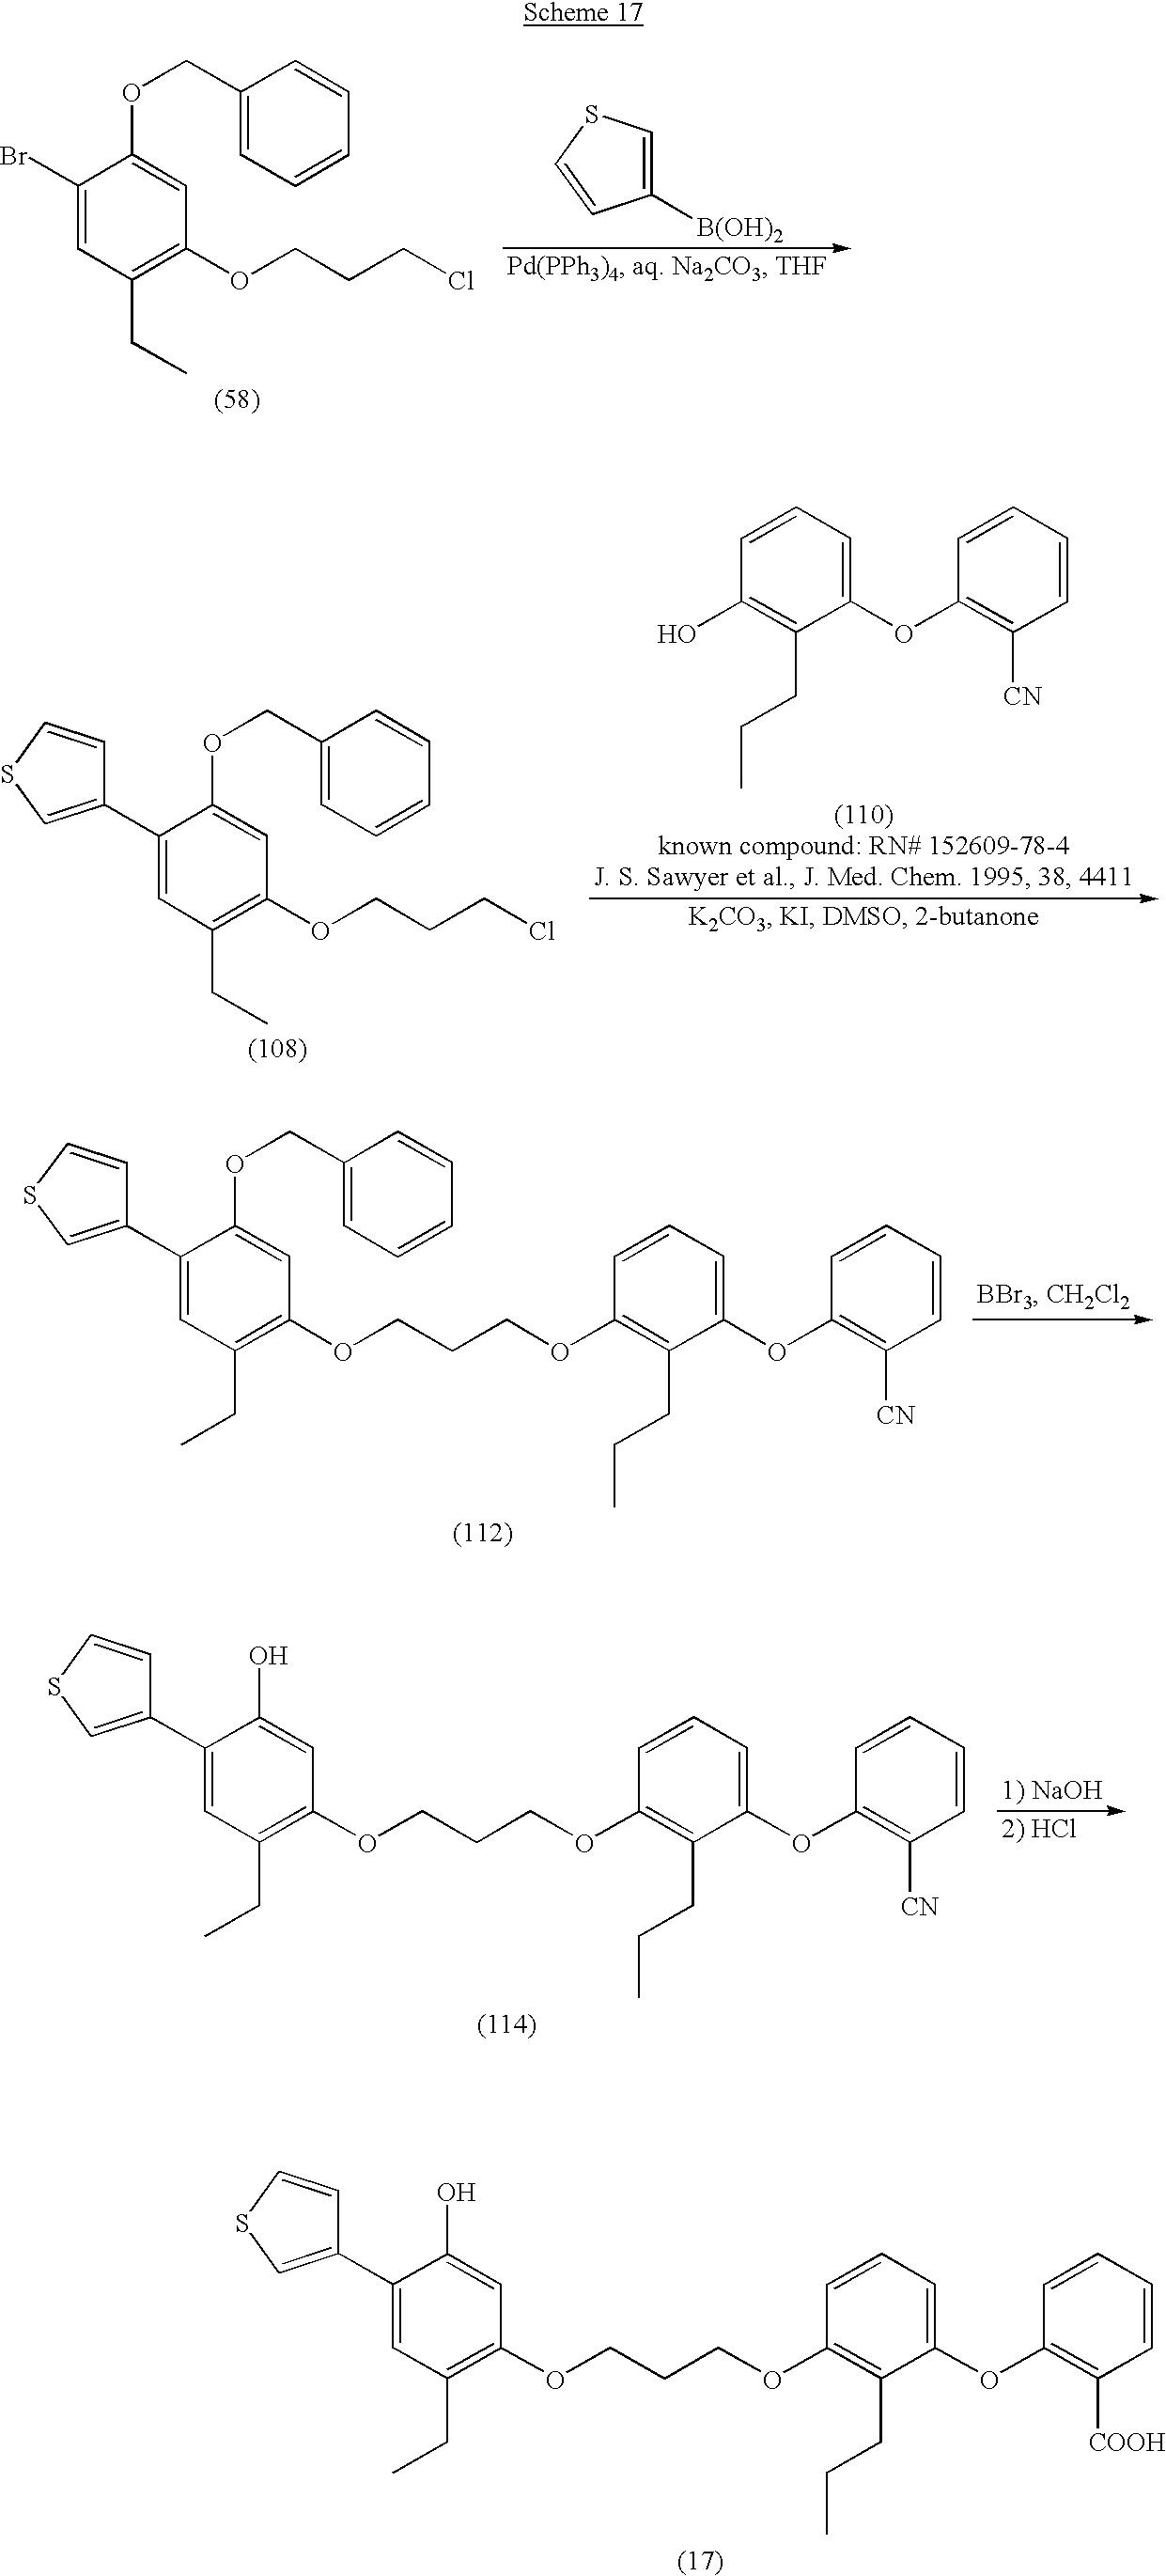 us6797723b1 heterocycle substituted diphenyl leukotriene 1740s Fashion figure us06797723 20040928 c00044